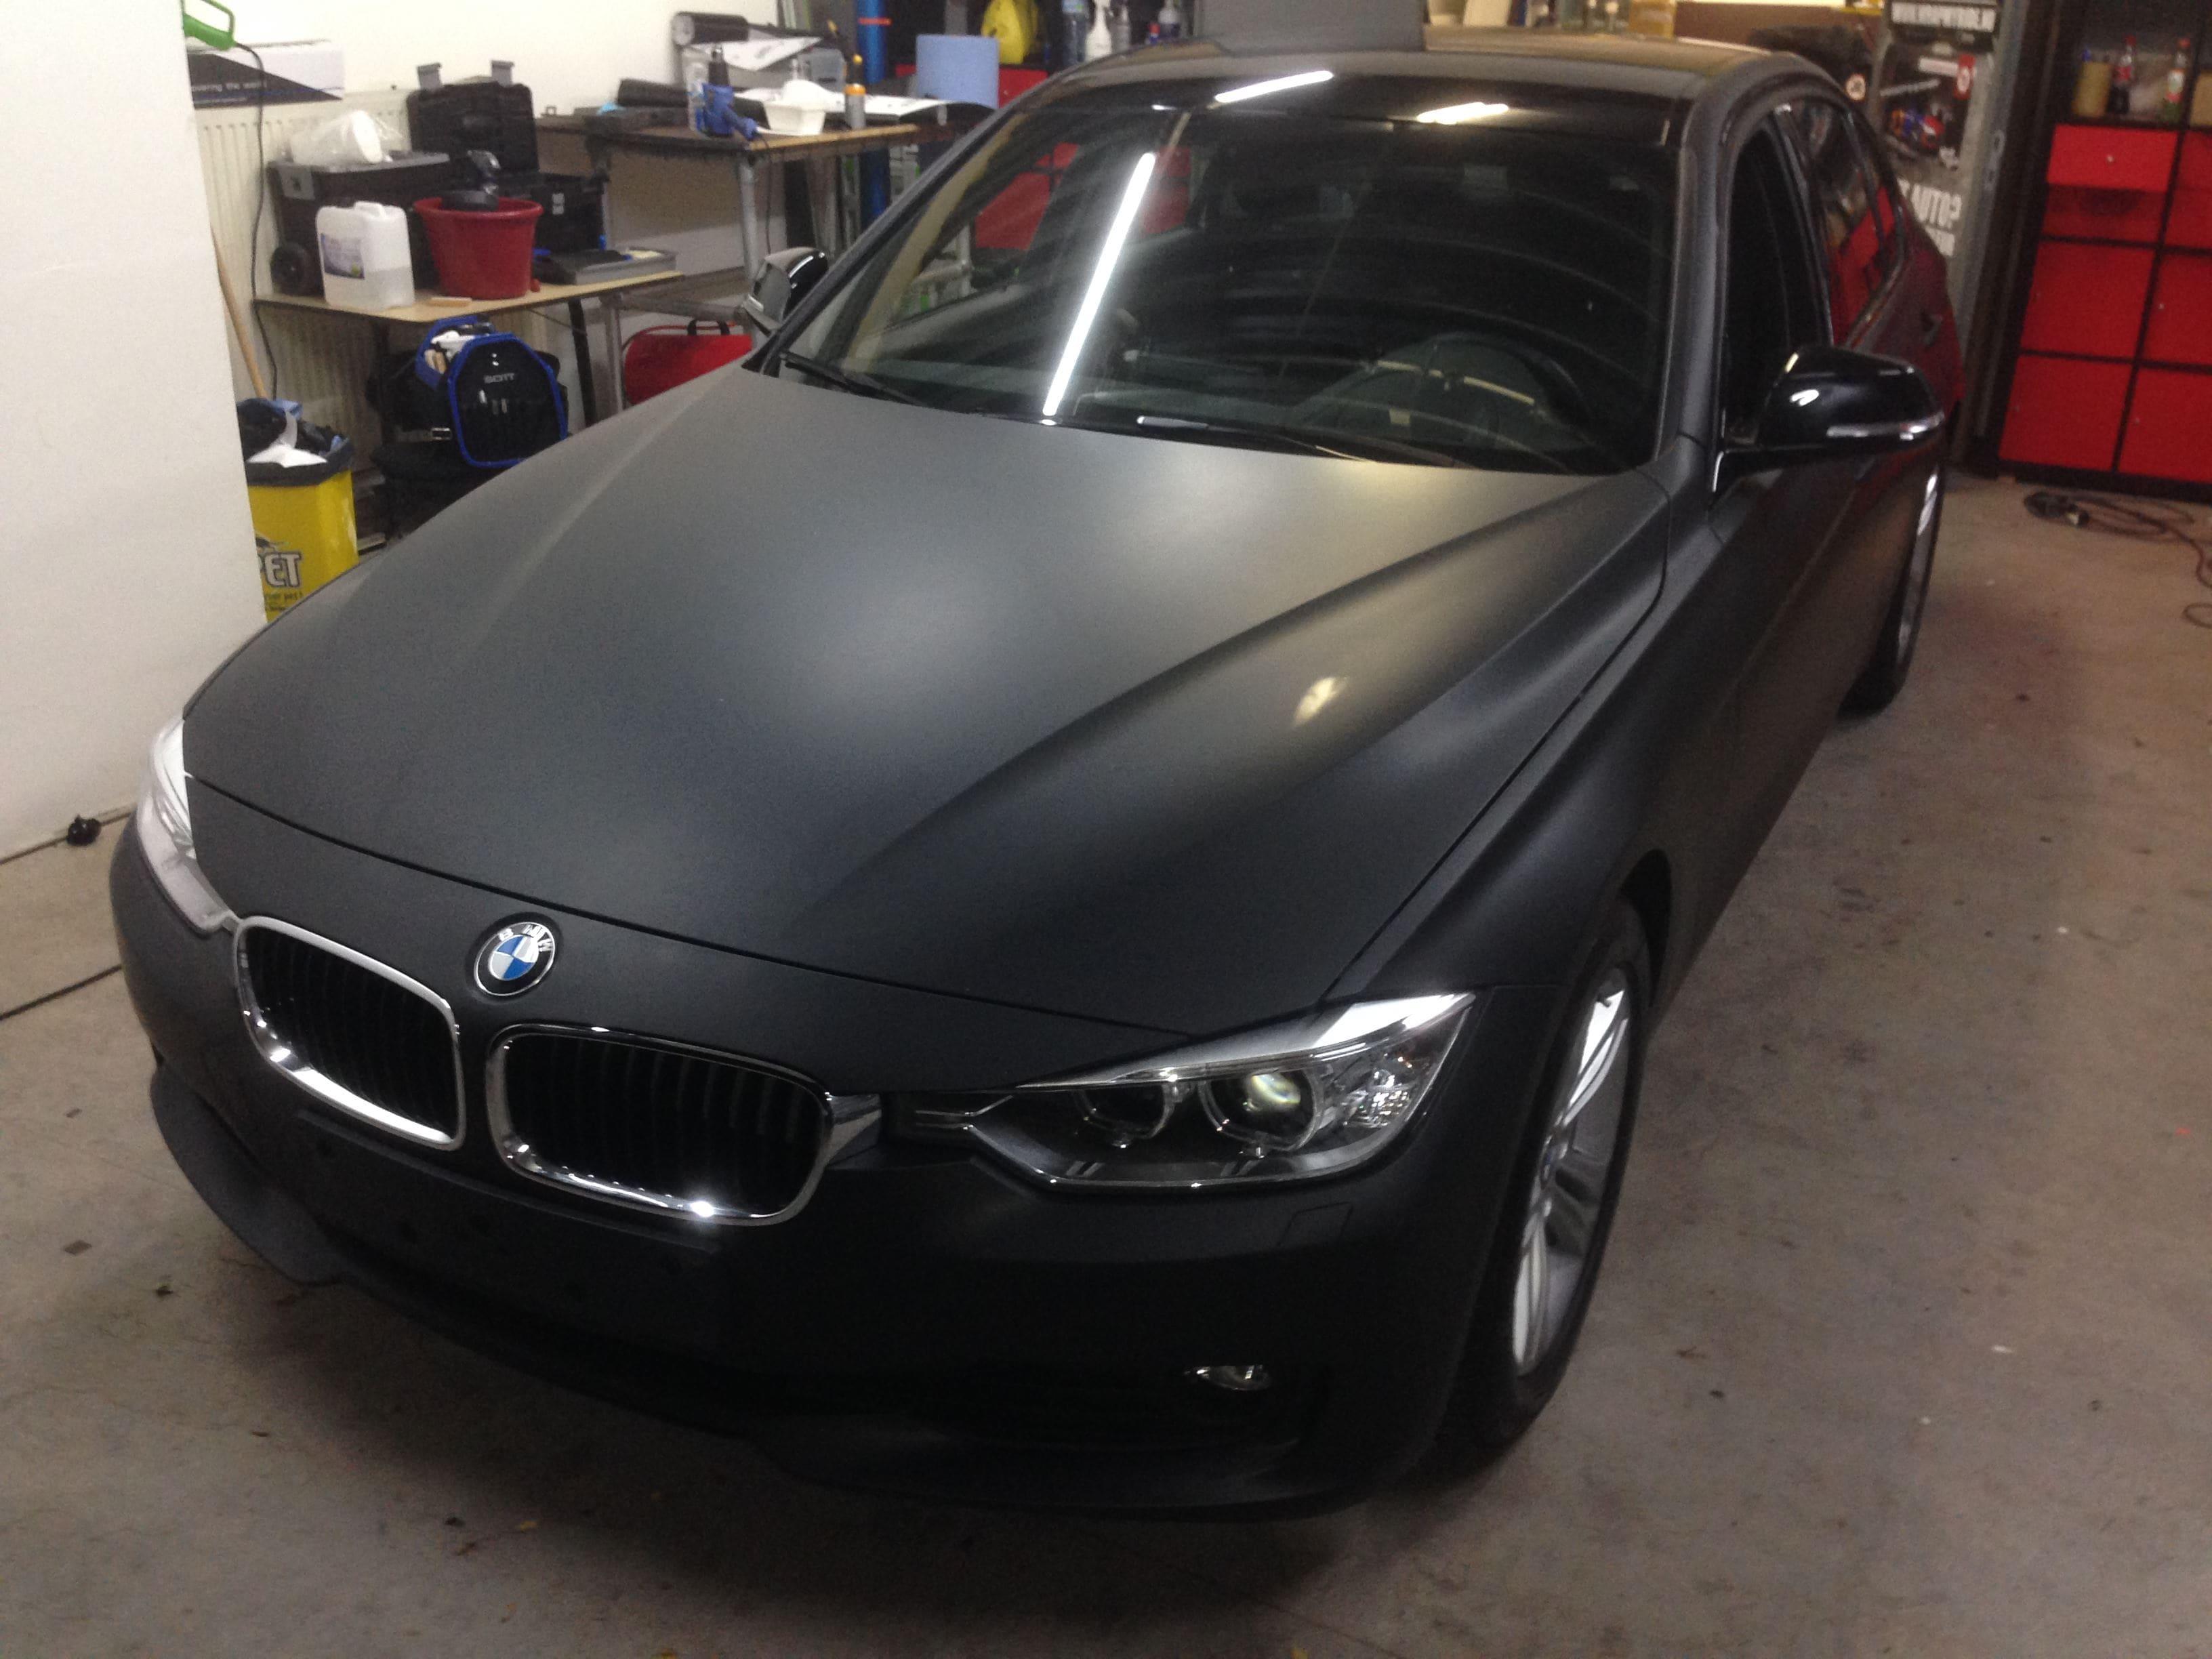 BMW E92 3 Serie met Mat Zwarte Wrap, Carwrapping door Wrapmyride.nu Foto-nr:5414, ©2021